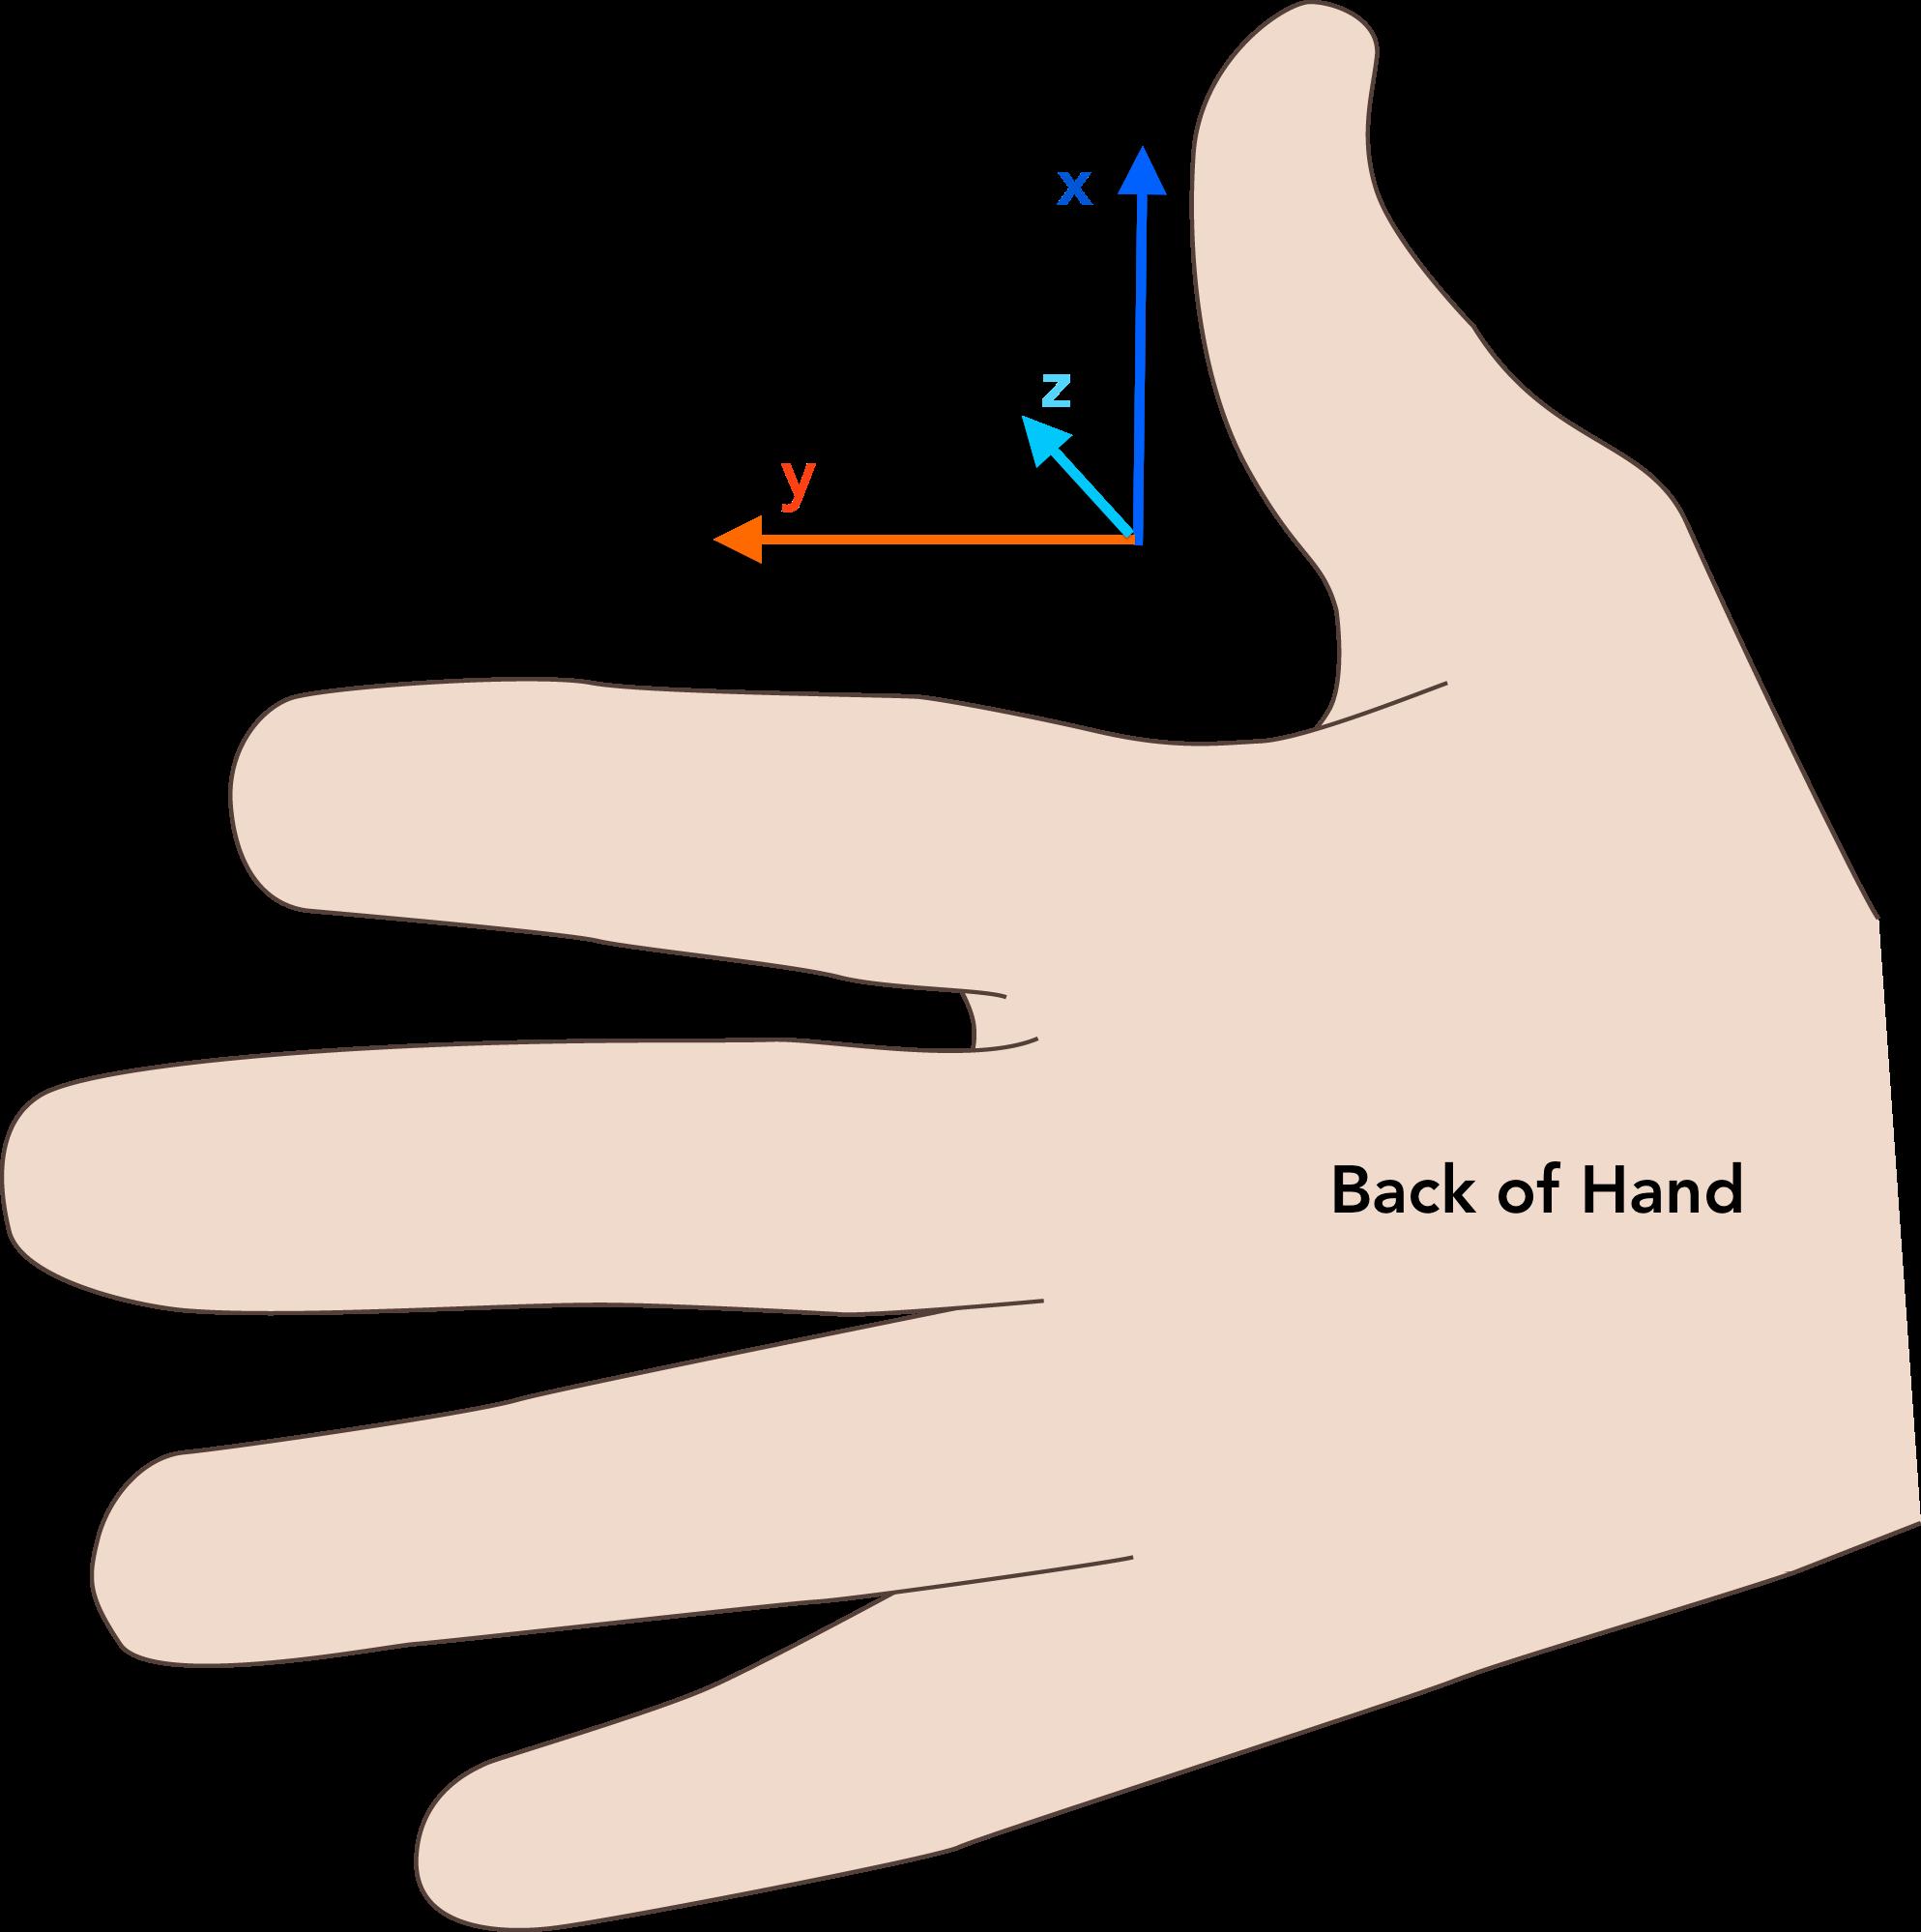 Handshake clipart clasped hand. Coding manual thumb orientation